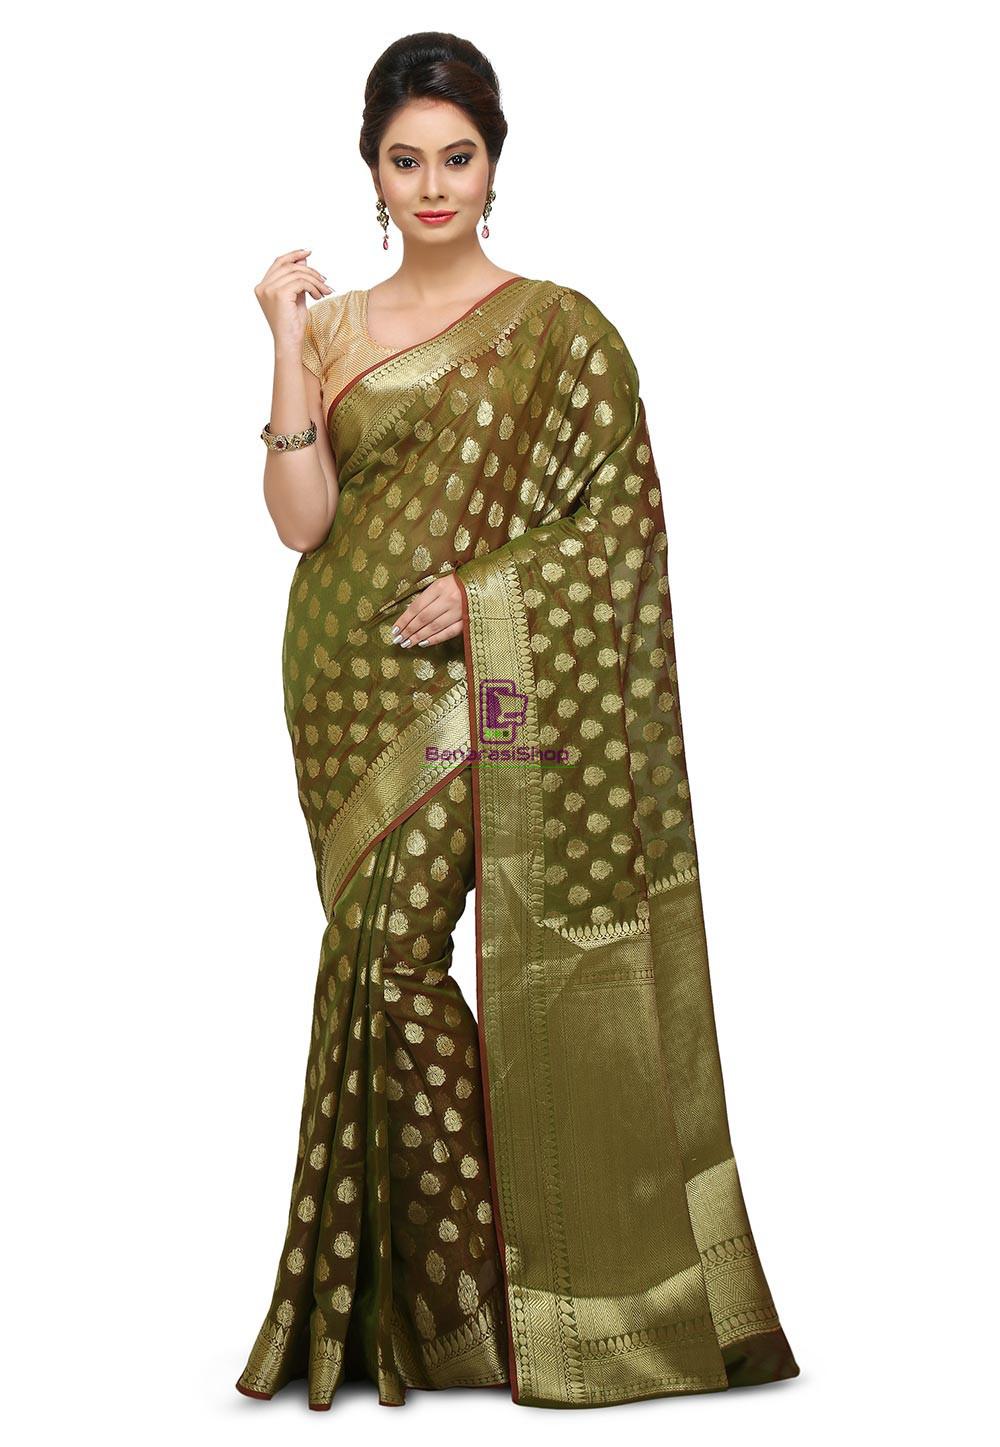 Banarasi Saree in Olive Green 1